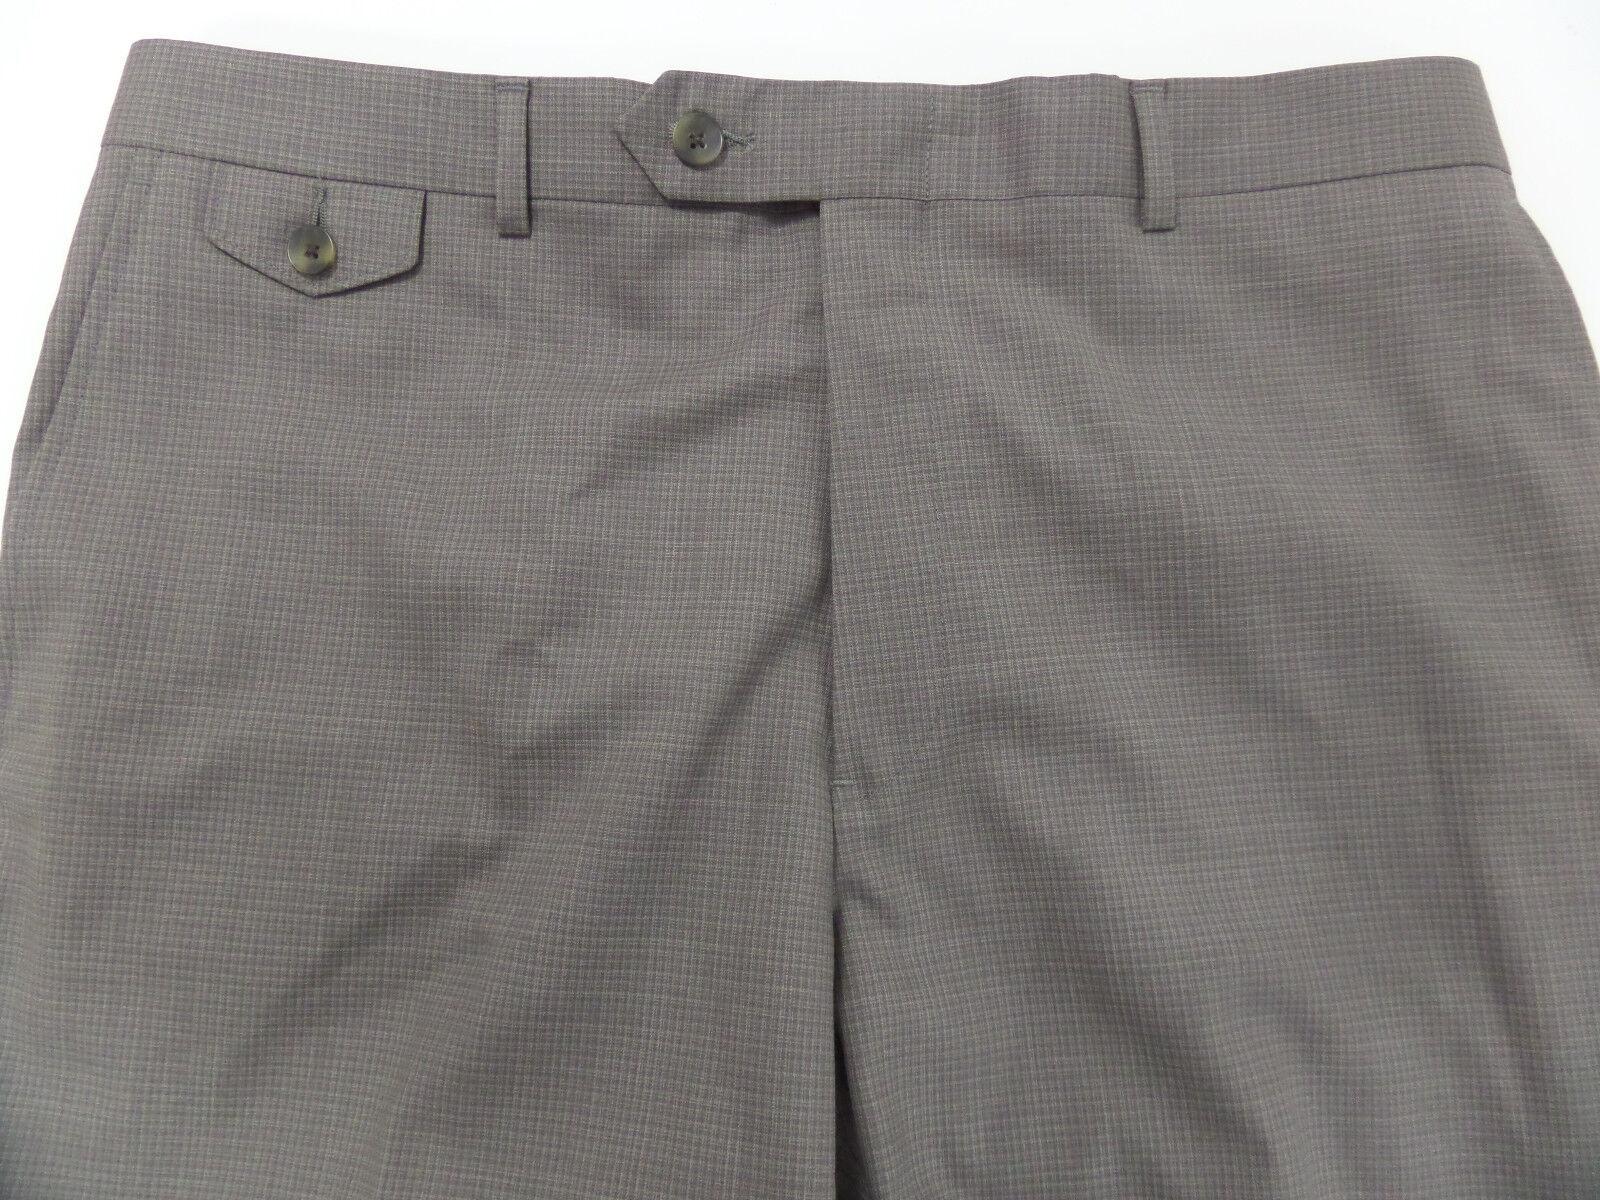 HART SCHAFFNER MARX WOOL DRESS PANTS FLAT MENS 36 Unfinished